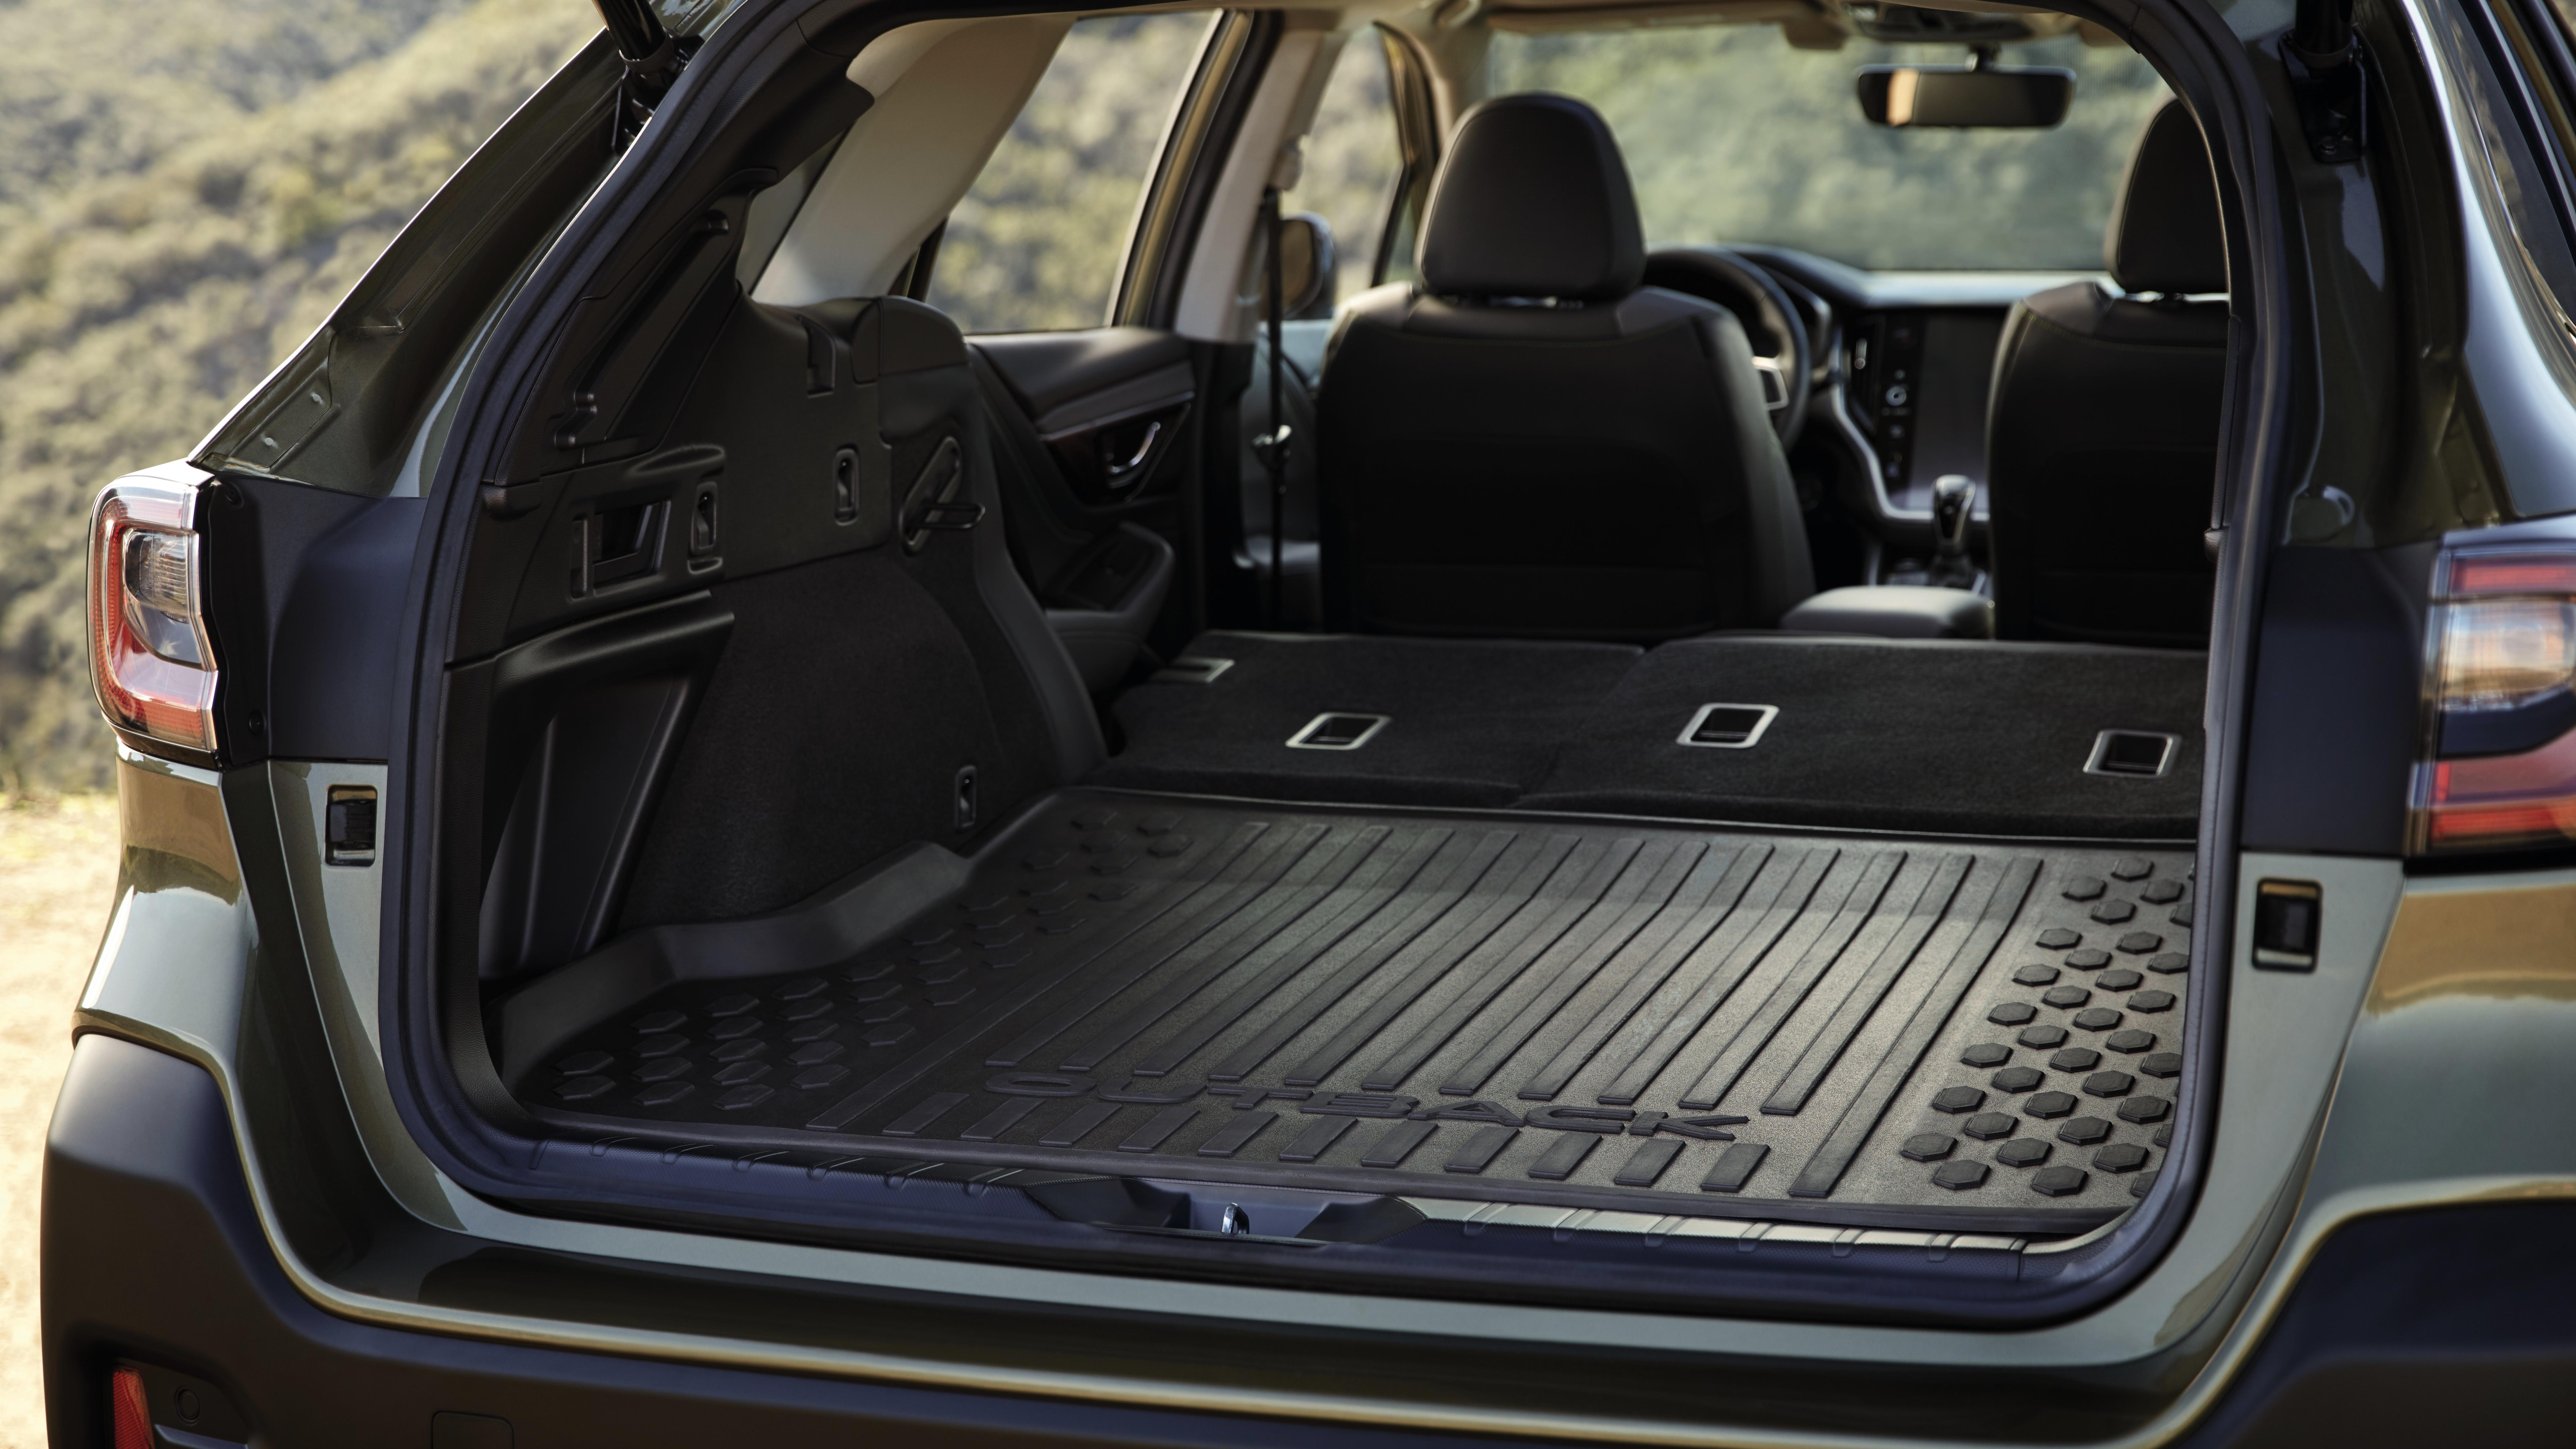 2020 Subaru Outback unveiled: Australian launch late 2019 or